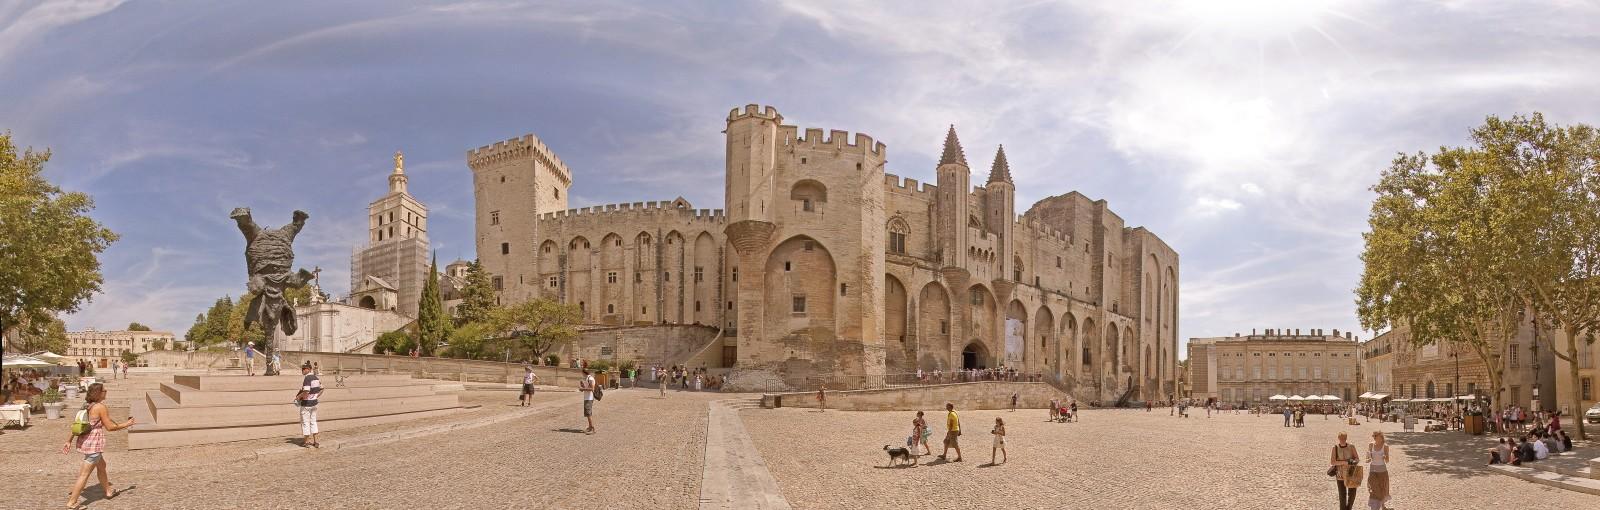 Tours Provence - Días completos - Excursiones desde París